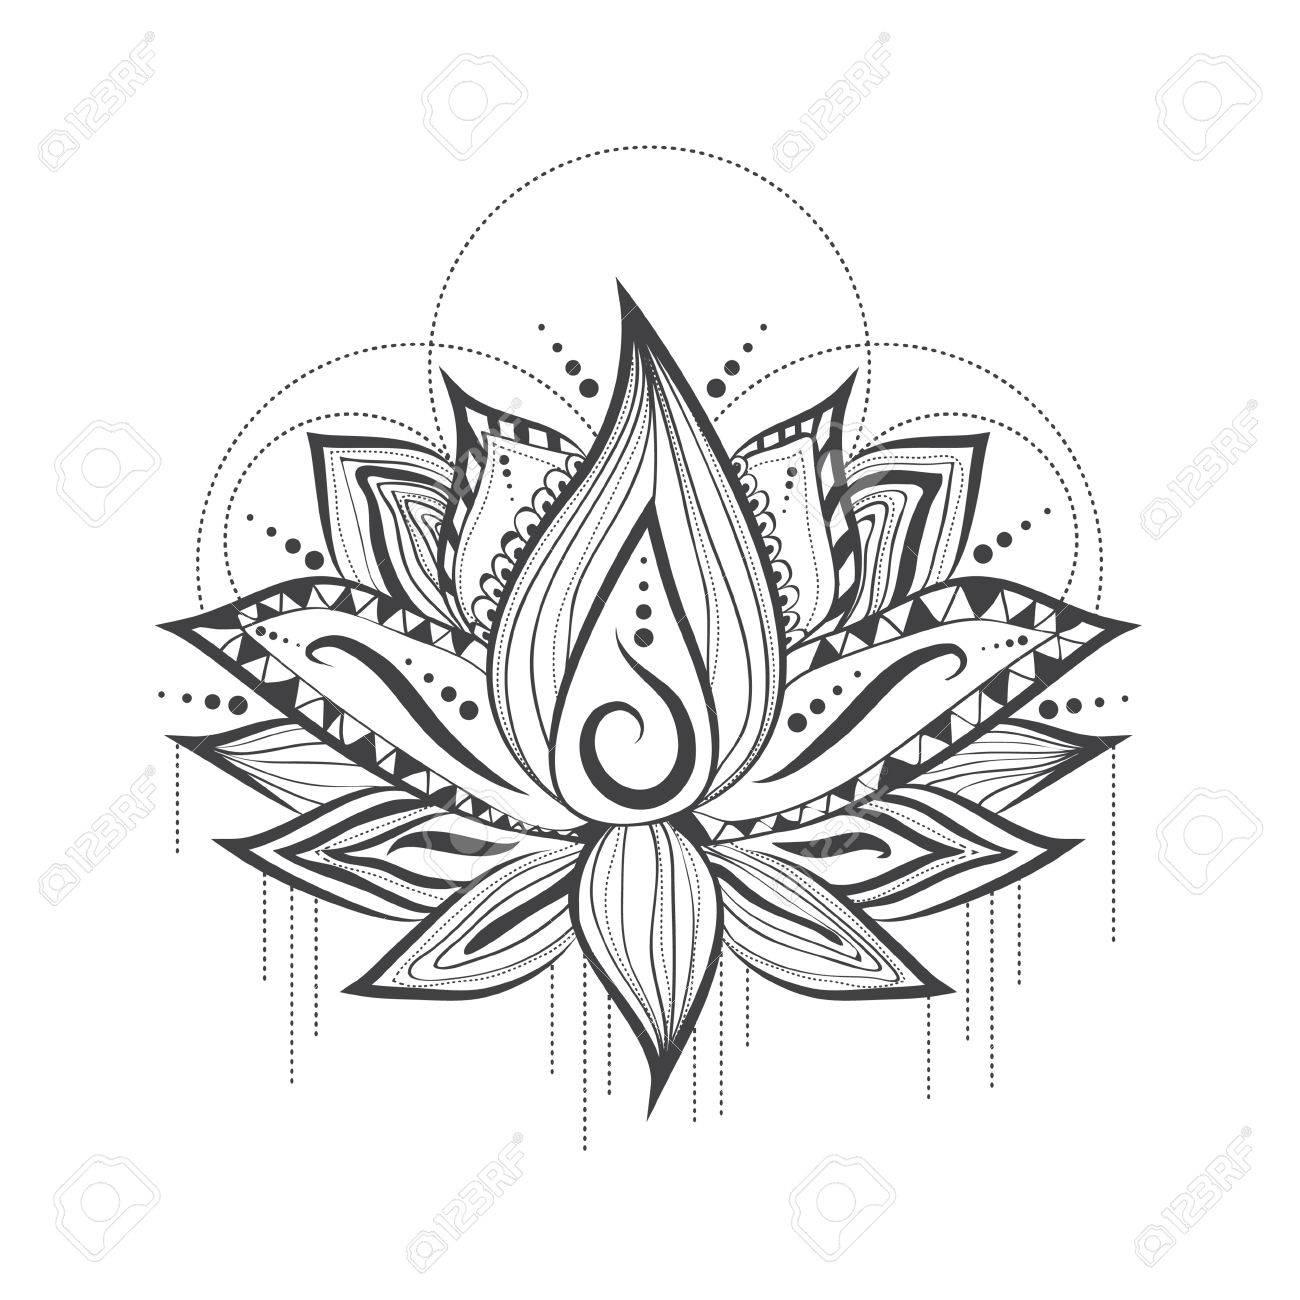 Illustration of abstract tattoo logo design of lilly lotus flower illustration of abstract tattoo logo design of lilly lotus flower stock vector 76372469 izmirmasajfo